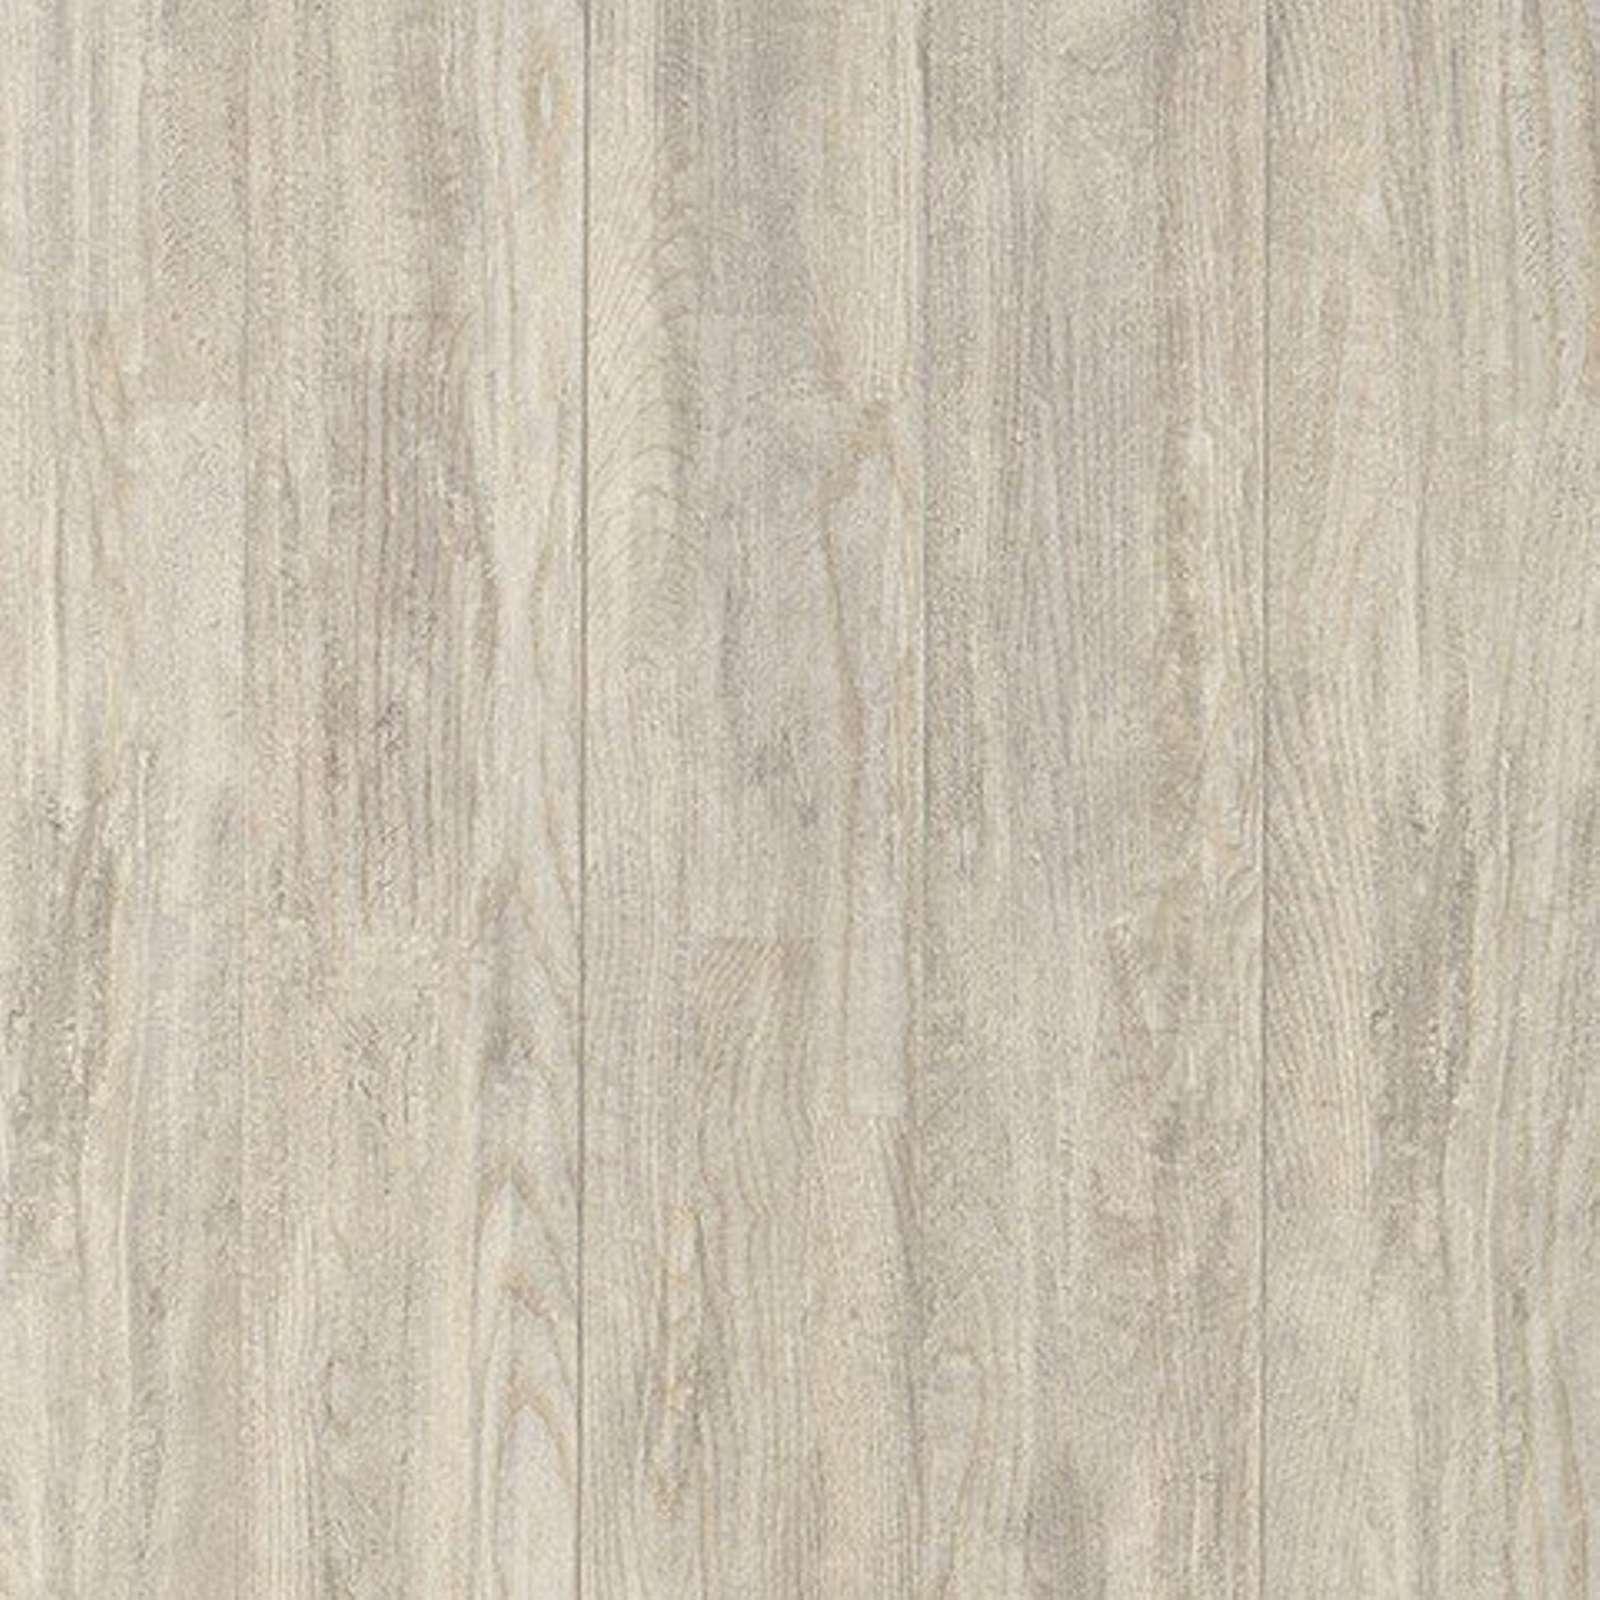 Паркет Tarkett Salsa ART White Canvas, 550050022, 2283х194х14 мм, (2.658м2/6шт)